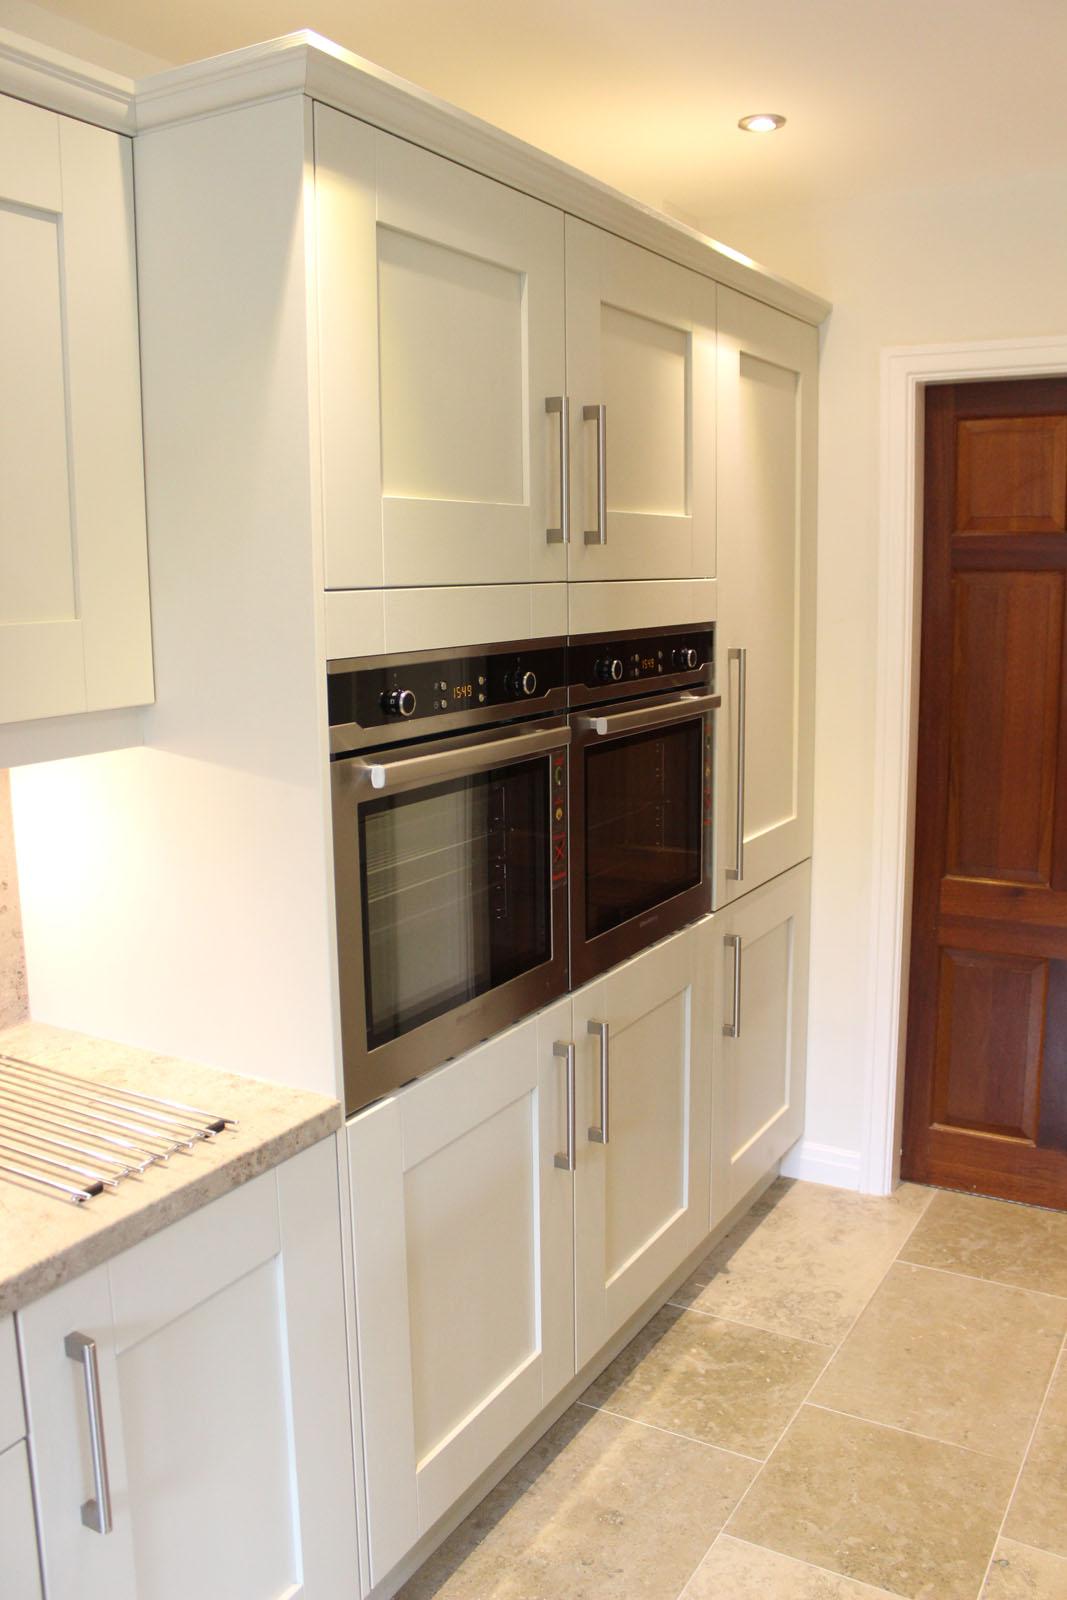 Mr Amp Mrs Briton York Cheap Kitchen Units And Cabinets